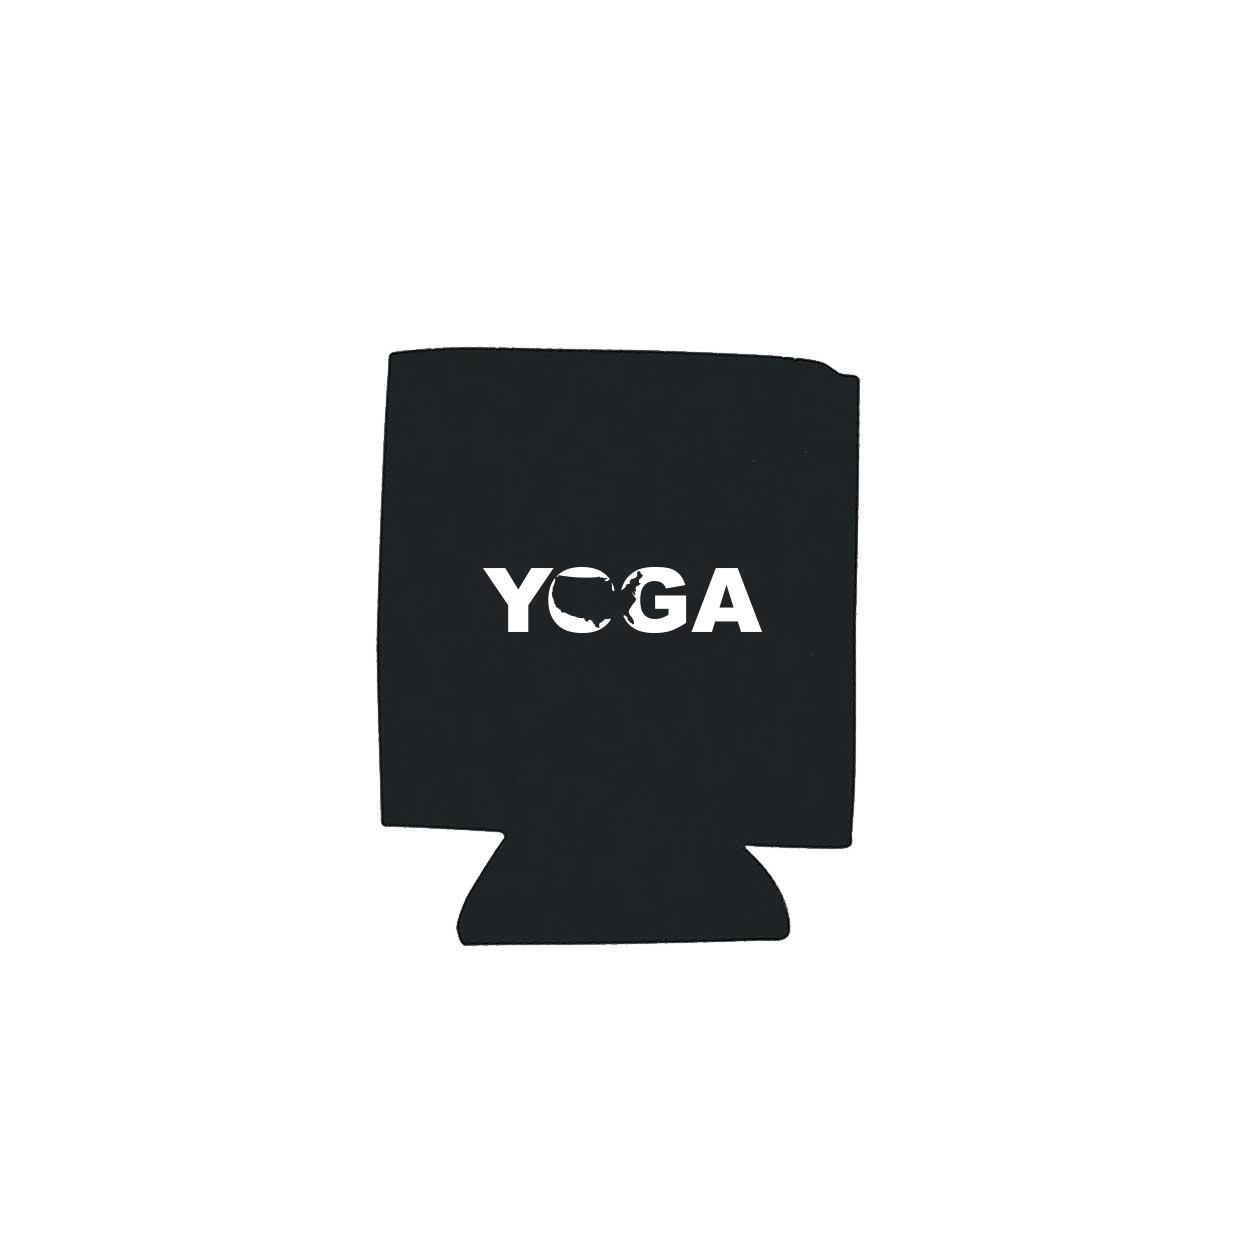 Yoga United States Koozie Black (White Logo)